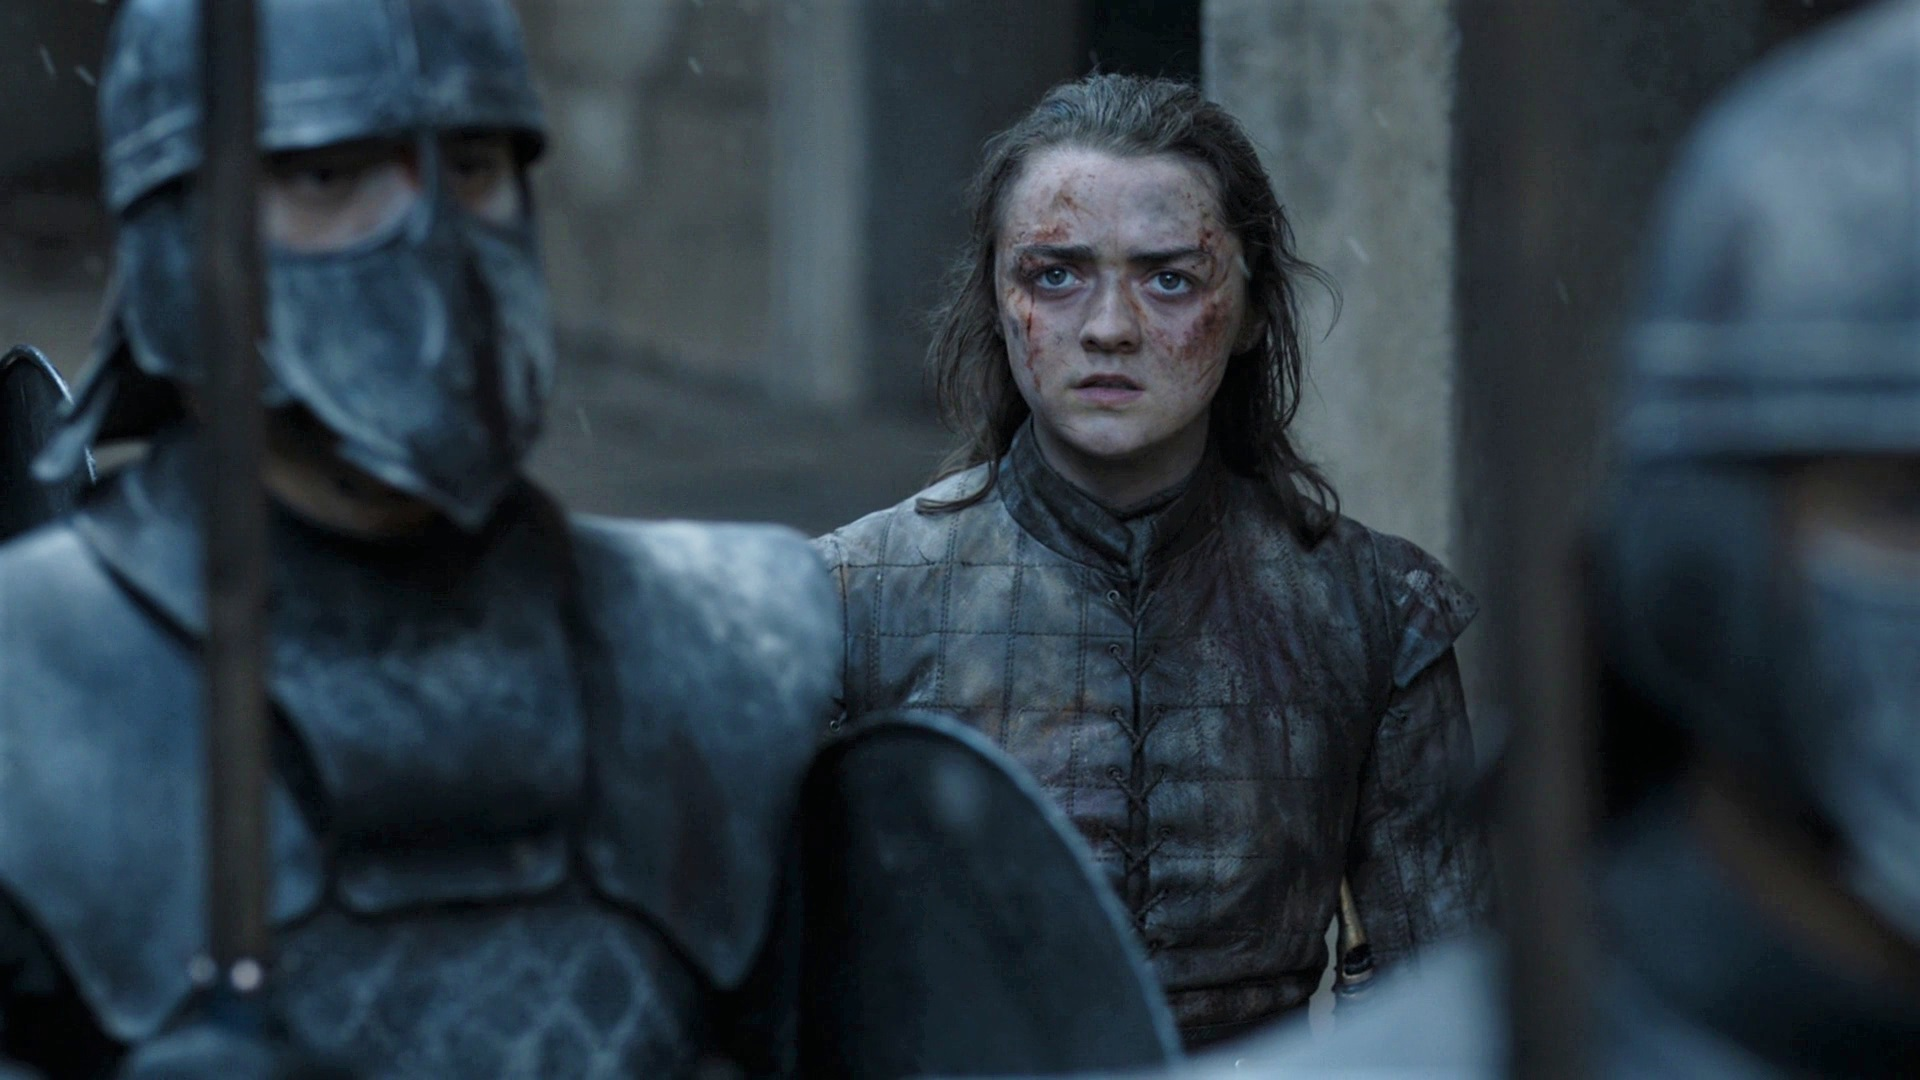 Hbo Confirme Que Game Of Thrones N Aura Pas De Suite Et